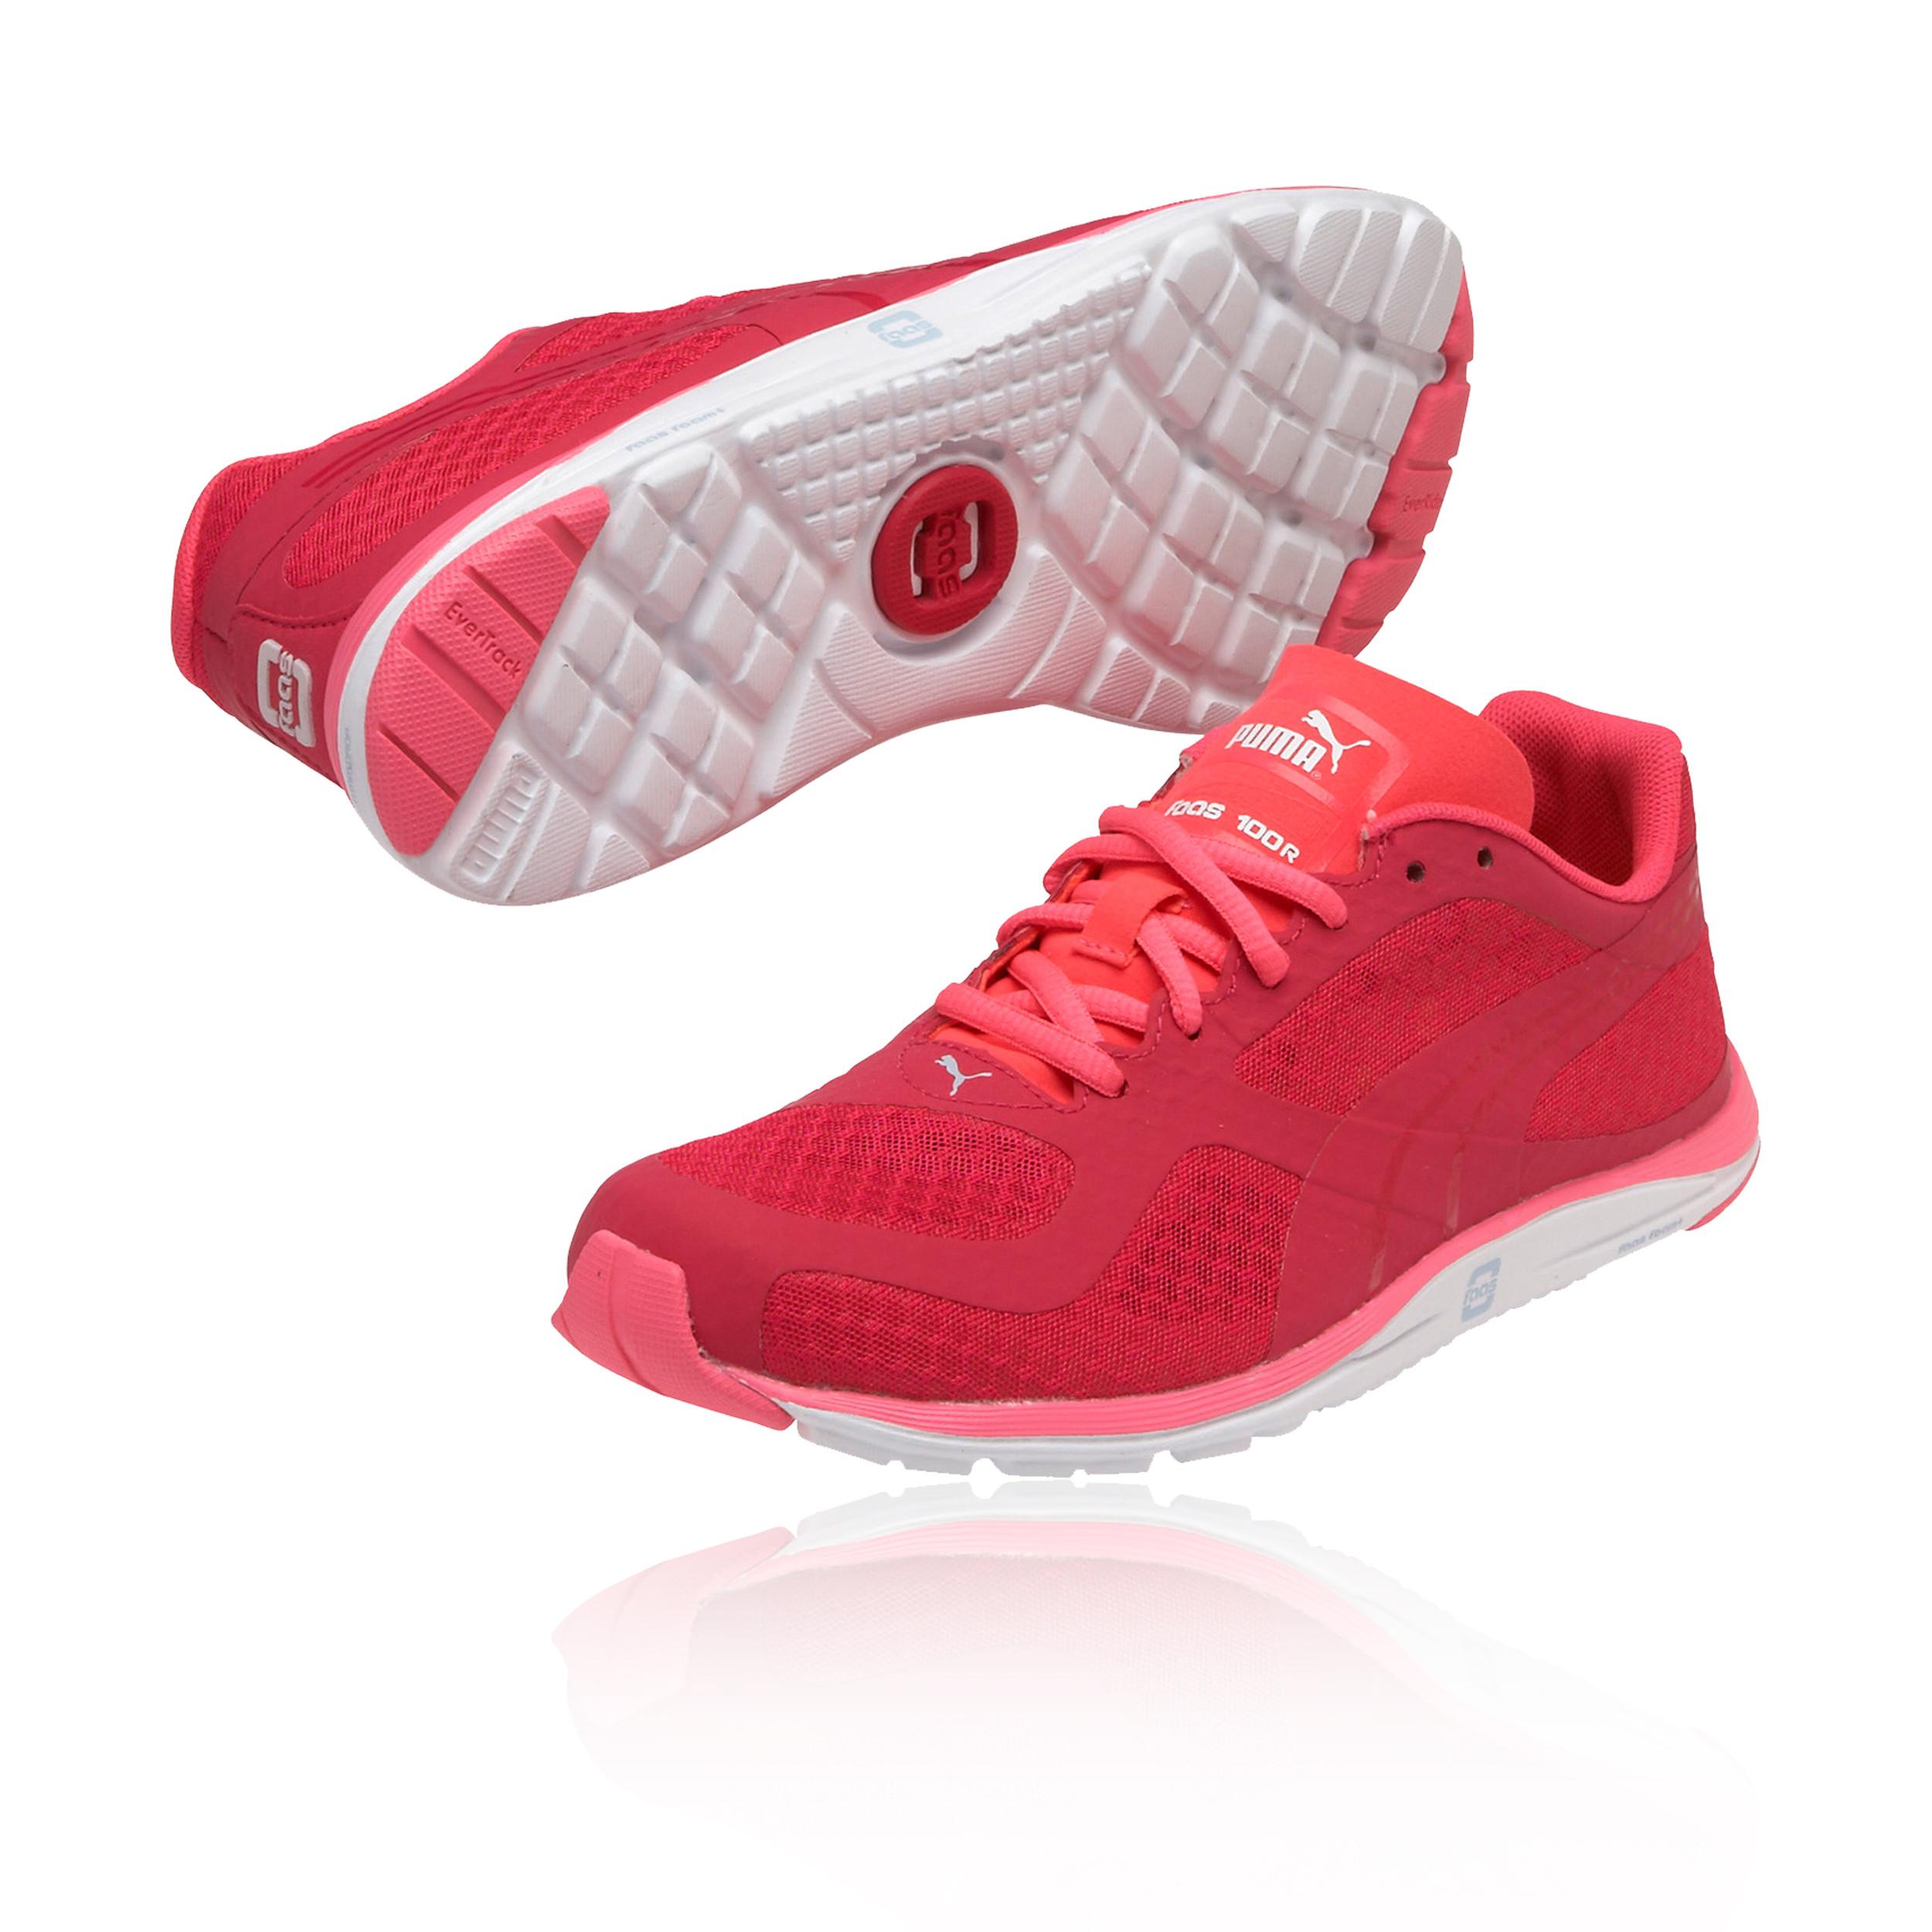 f147acae1ea6 PUMA Faas 100 Women s Shoes R